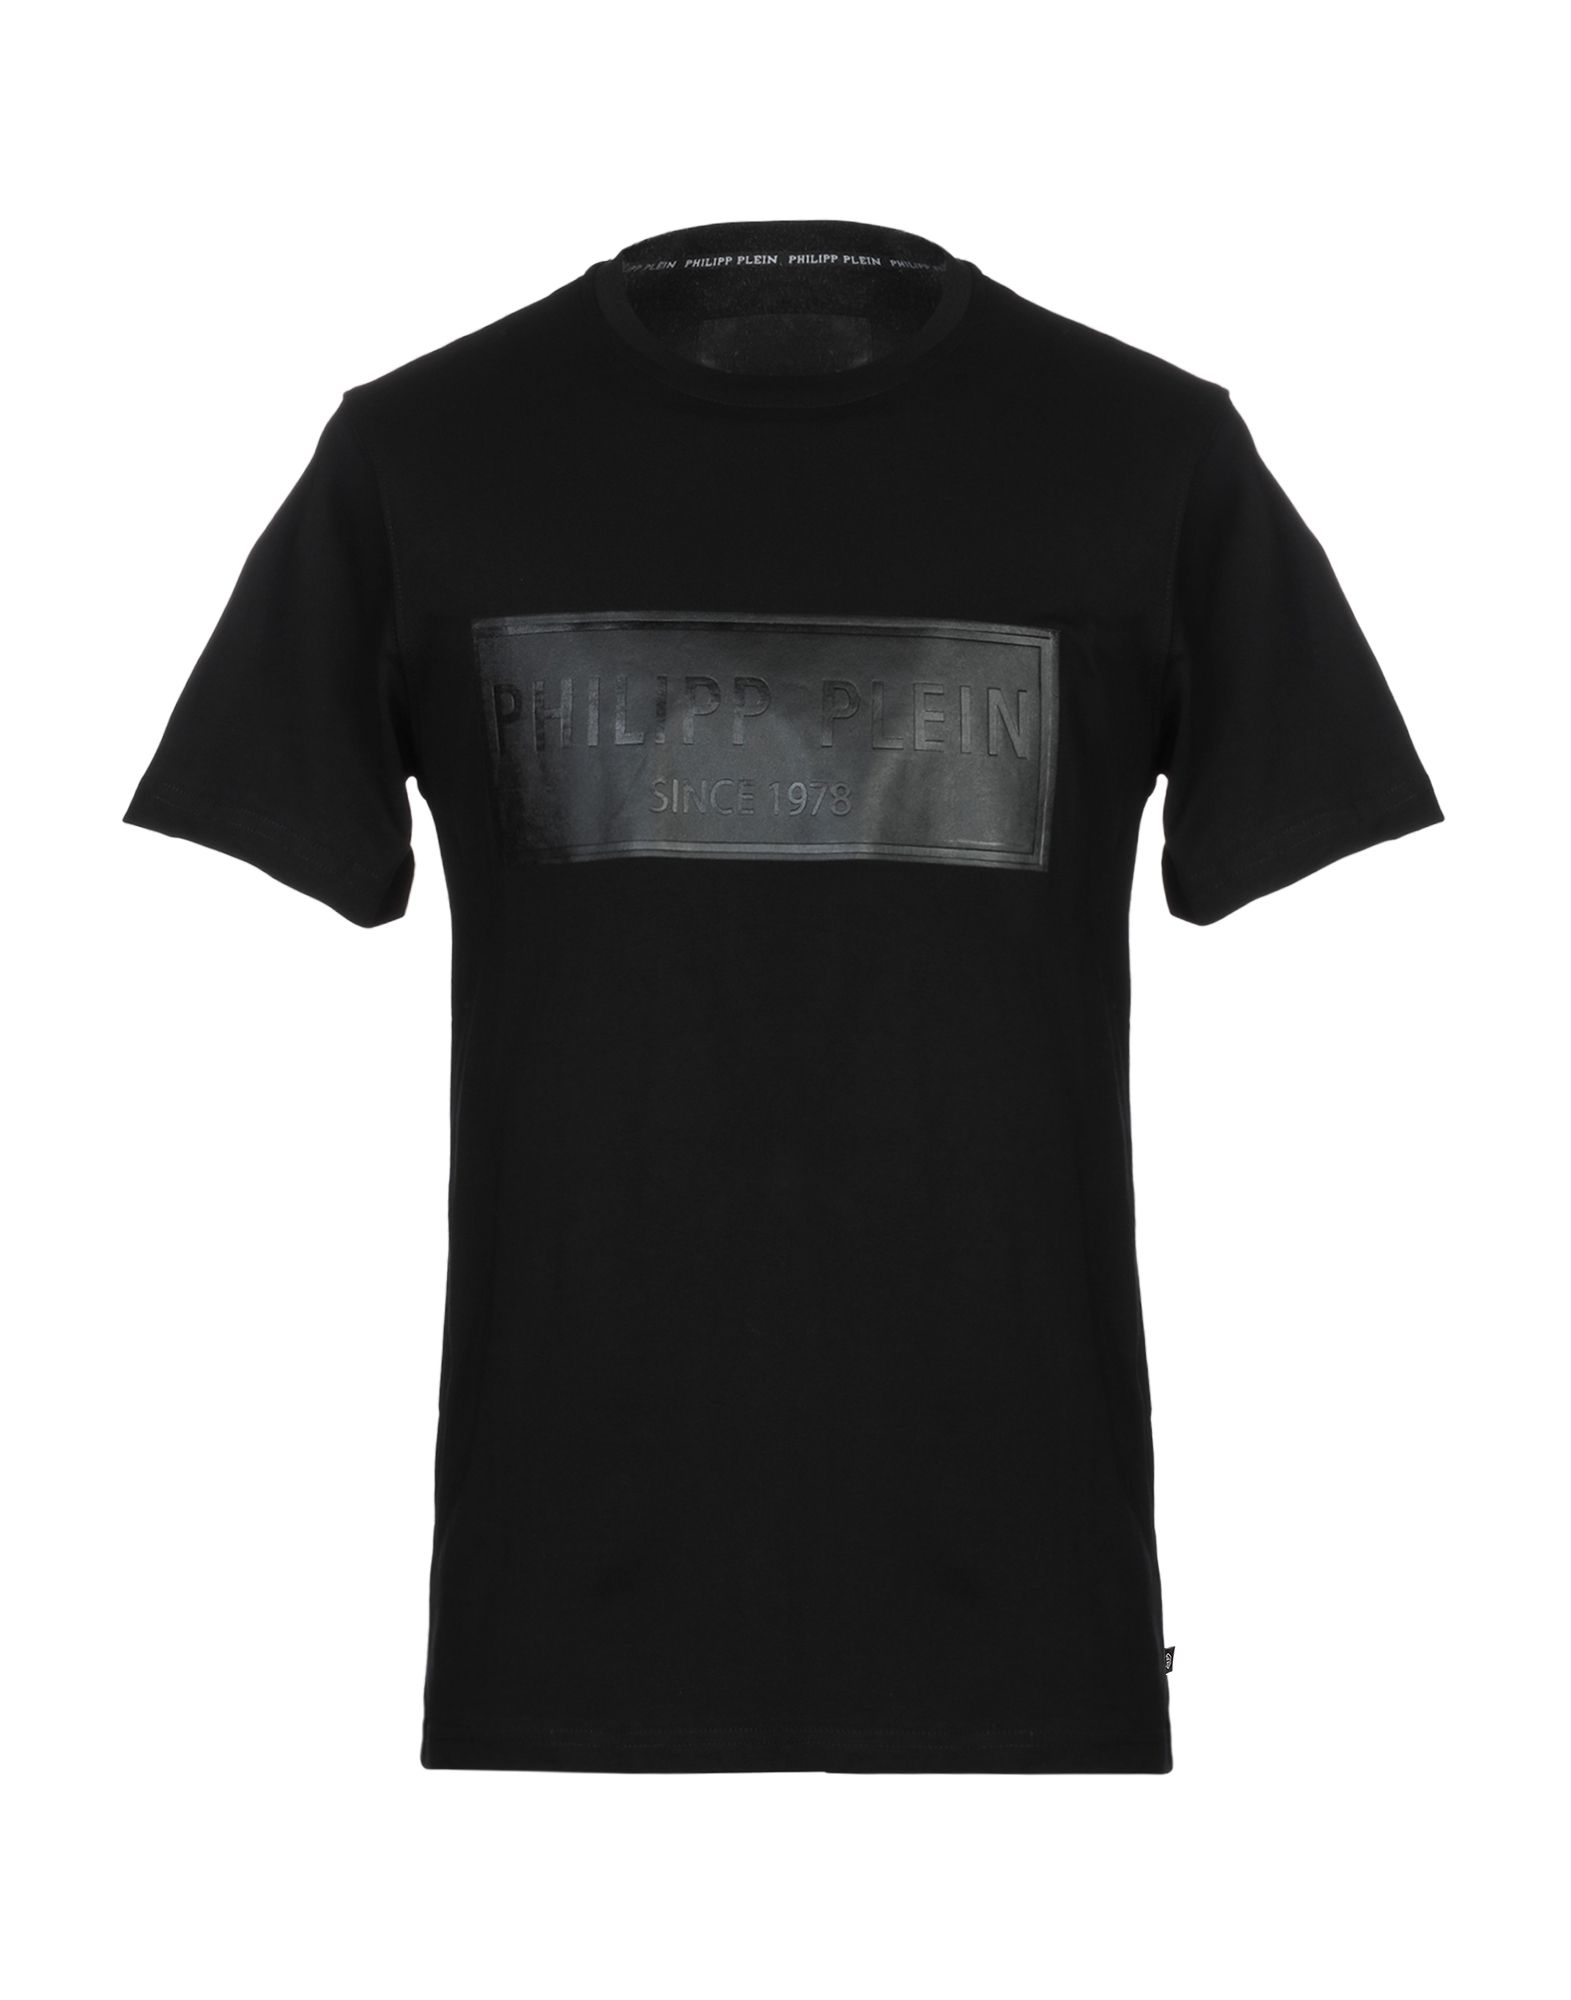 PHILIPP PLEIN Футболка футболка philipp plein футболки свободные